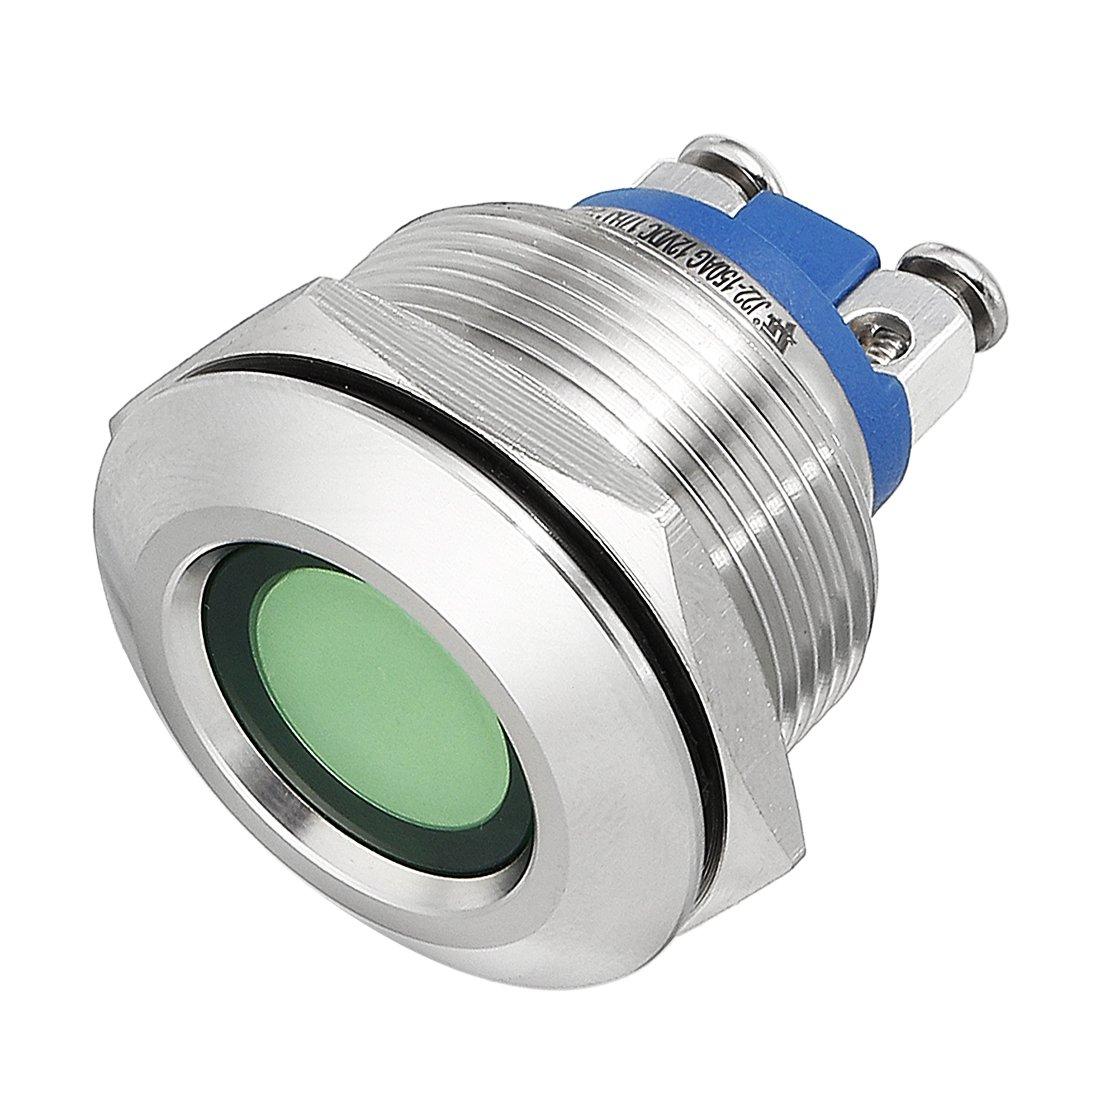 uxcell LED Indicator Light 12V 8mm Green Metal Shell Pilot Dash Signal Lamp High Shape Head